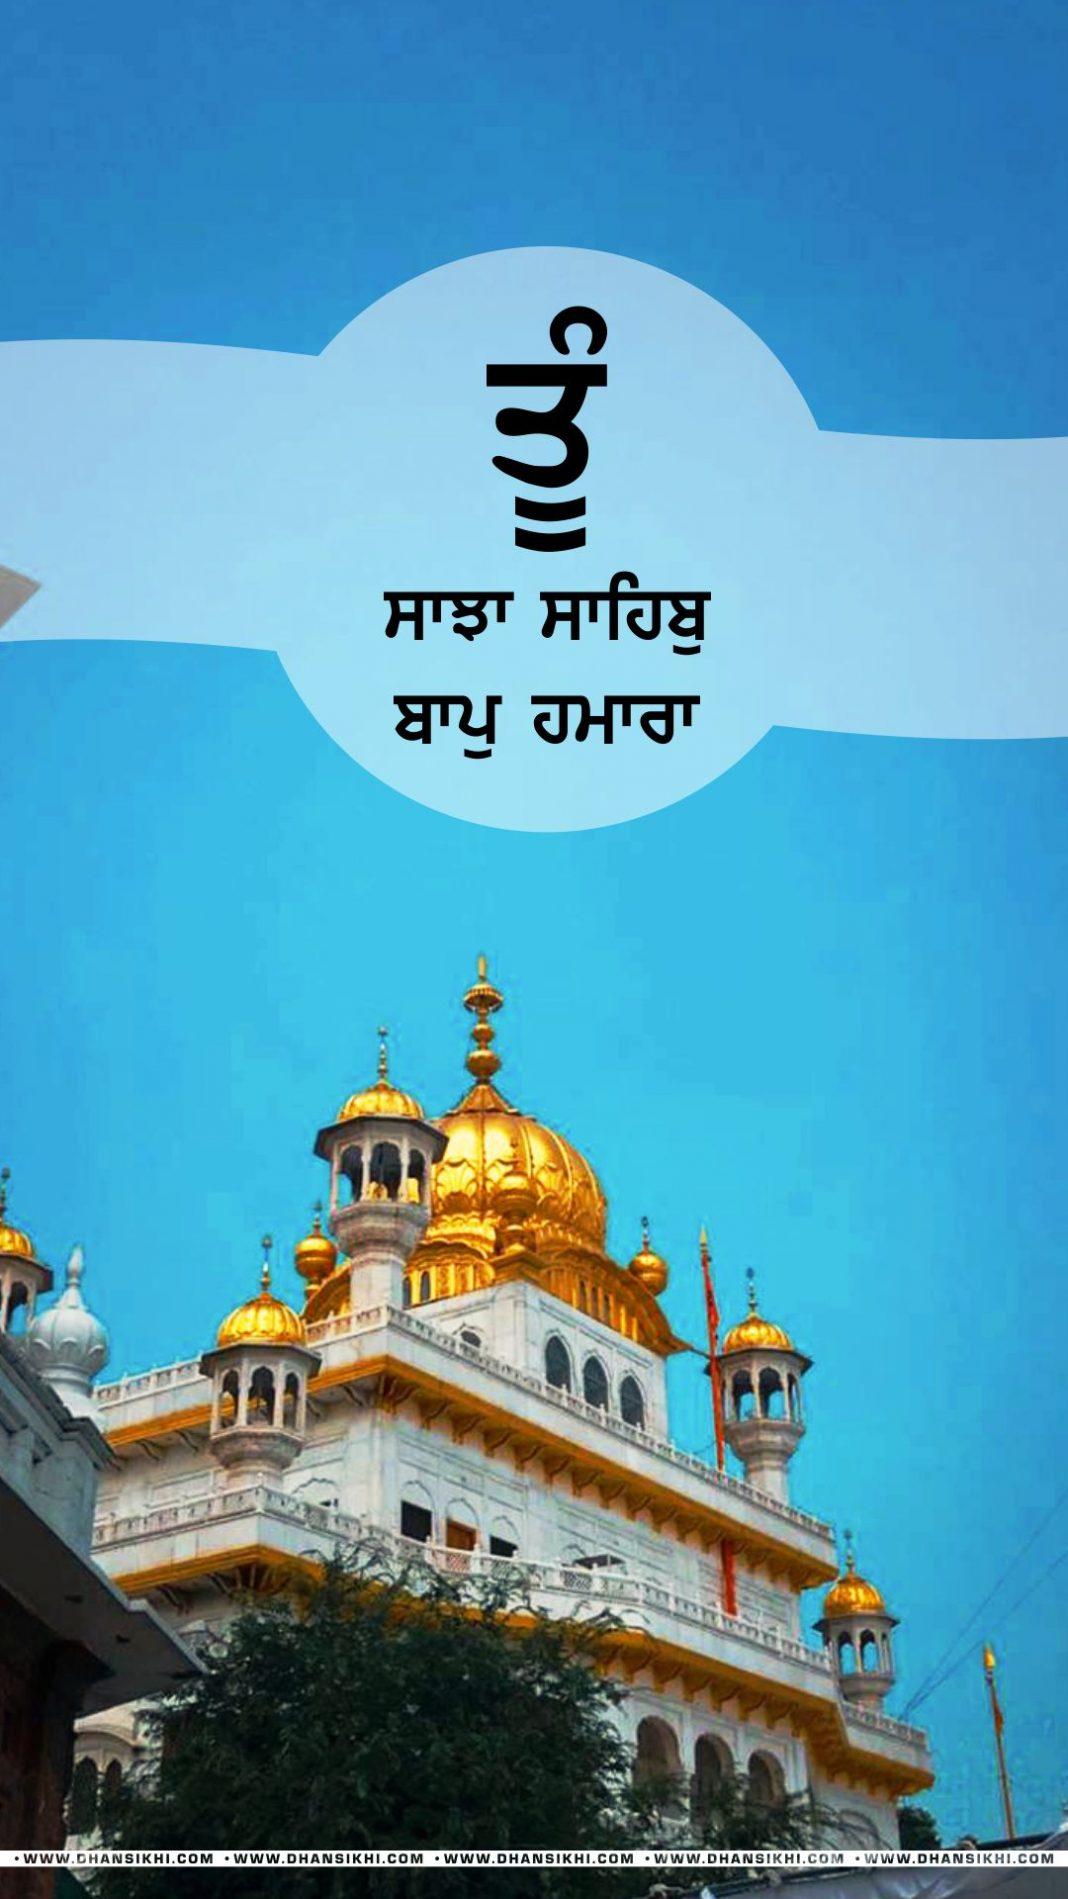 Mobile Wallpaper - Tu Sanjha Sahib Baap Hamara